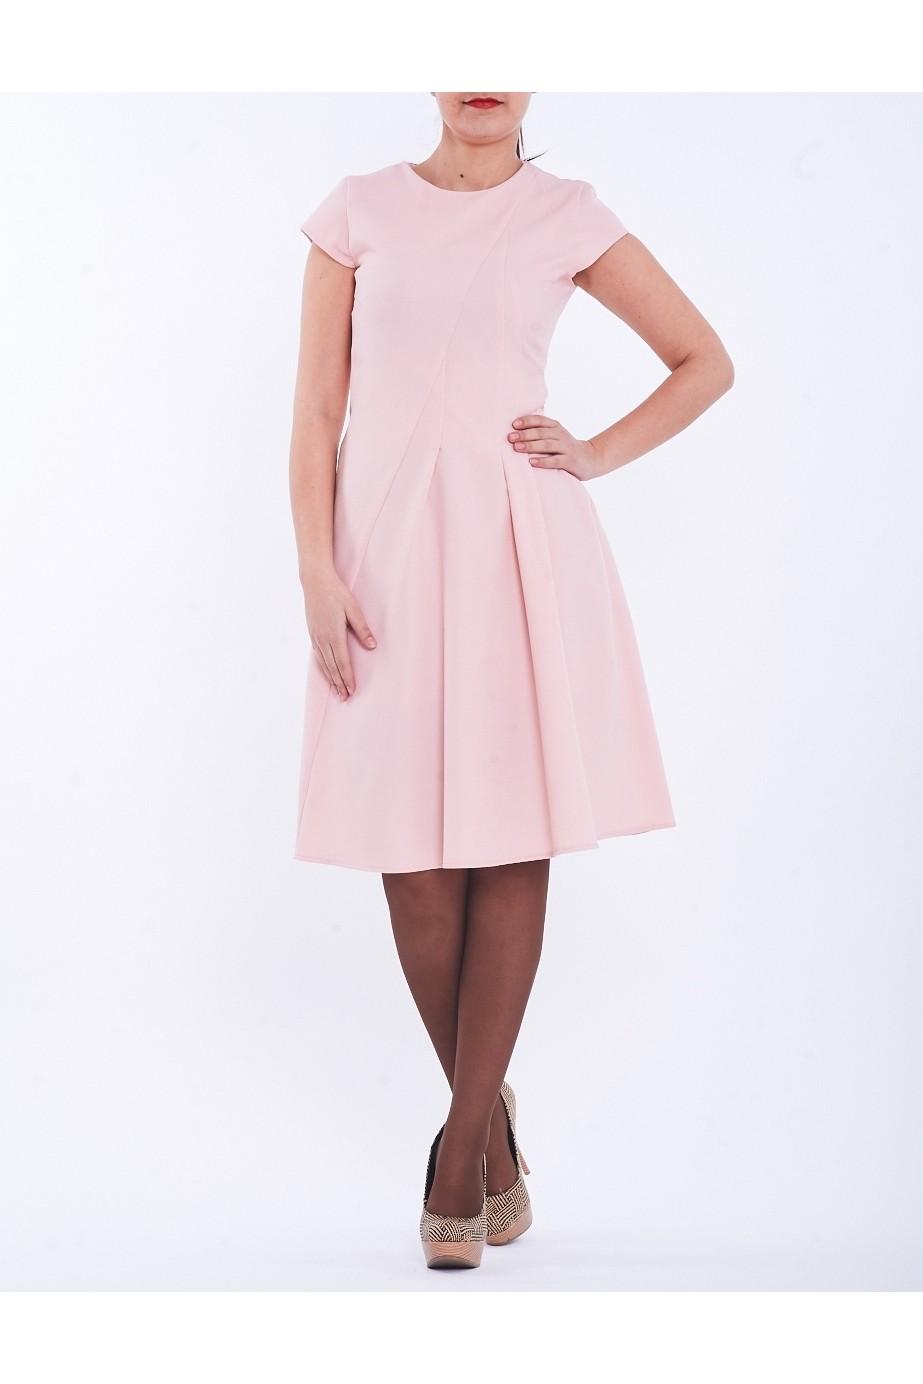 Rochie roz pal cu pliuri pe partea stanga TinaR 40